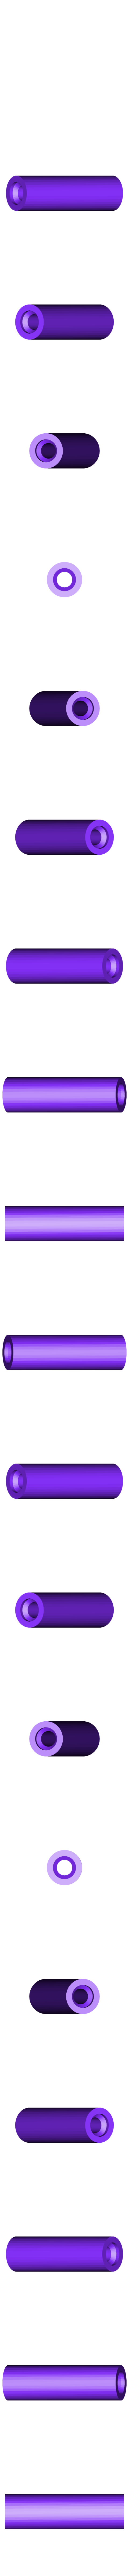 977ec563 ff47 4558 9f98 24c4b02a7223